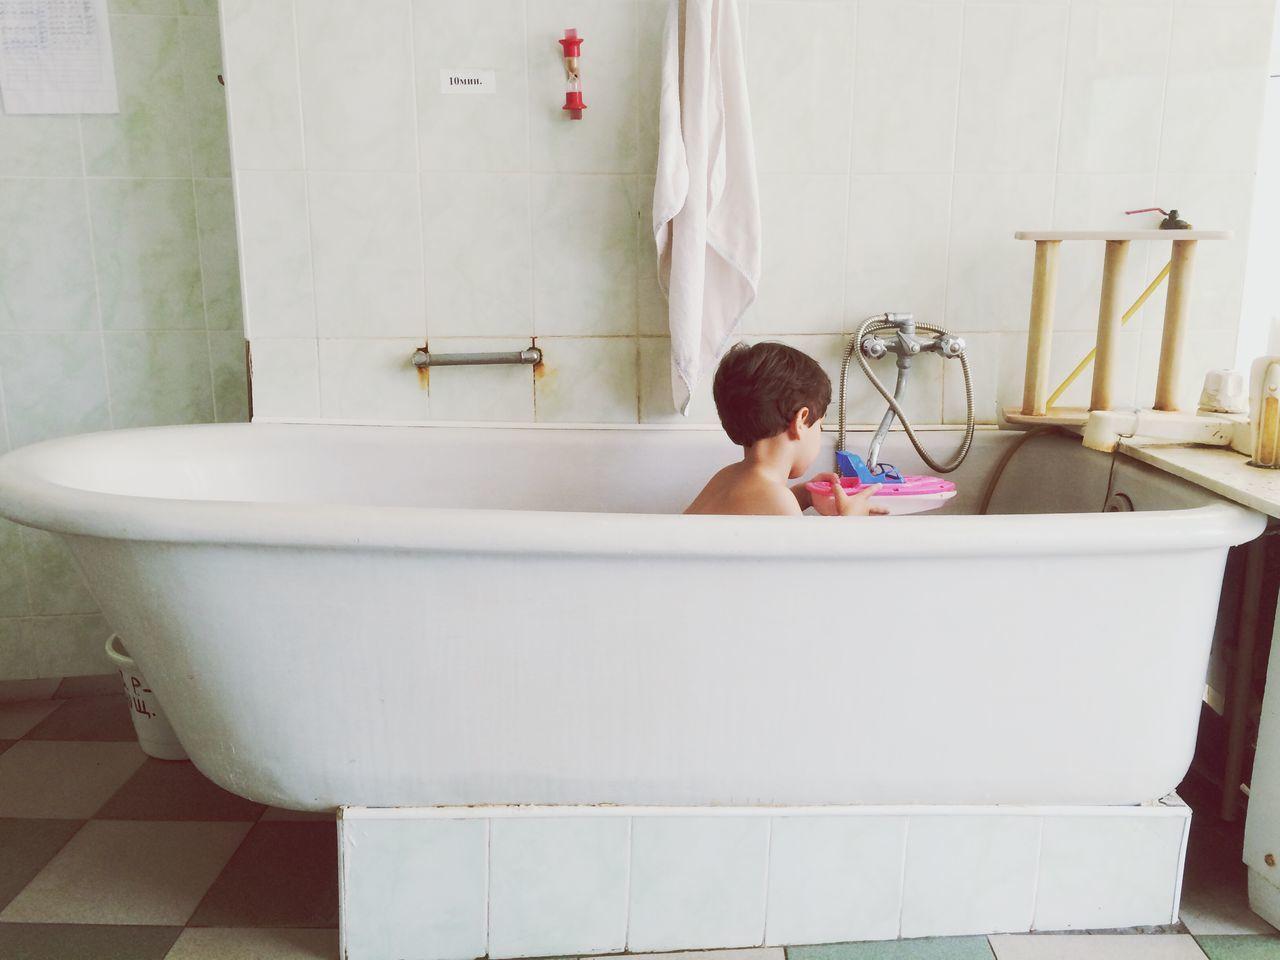 Beautiful stock photos of bad,  2-3 Years,  Boys,  Childhood,  Domestic Bathroom